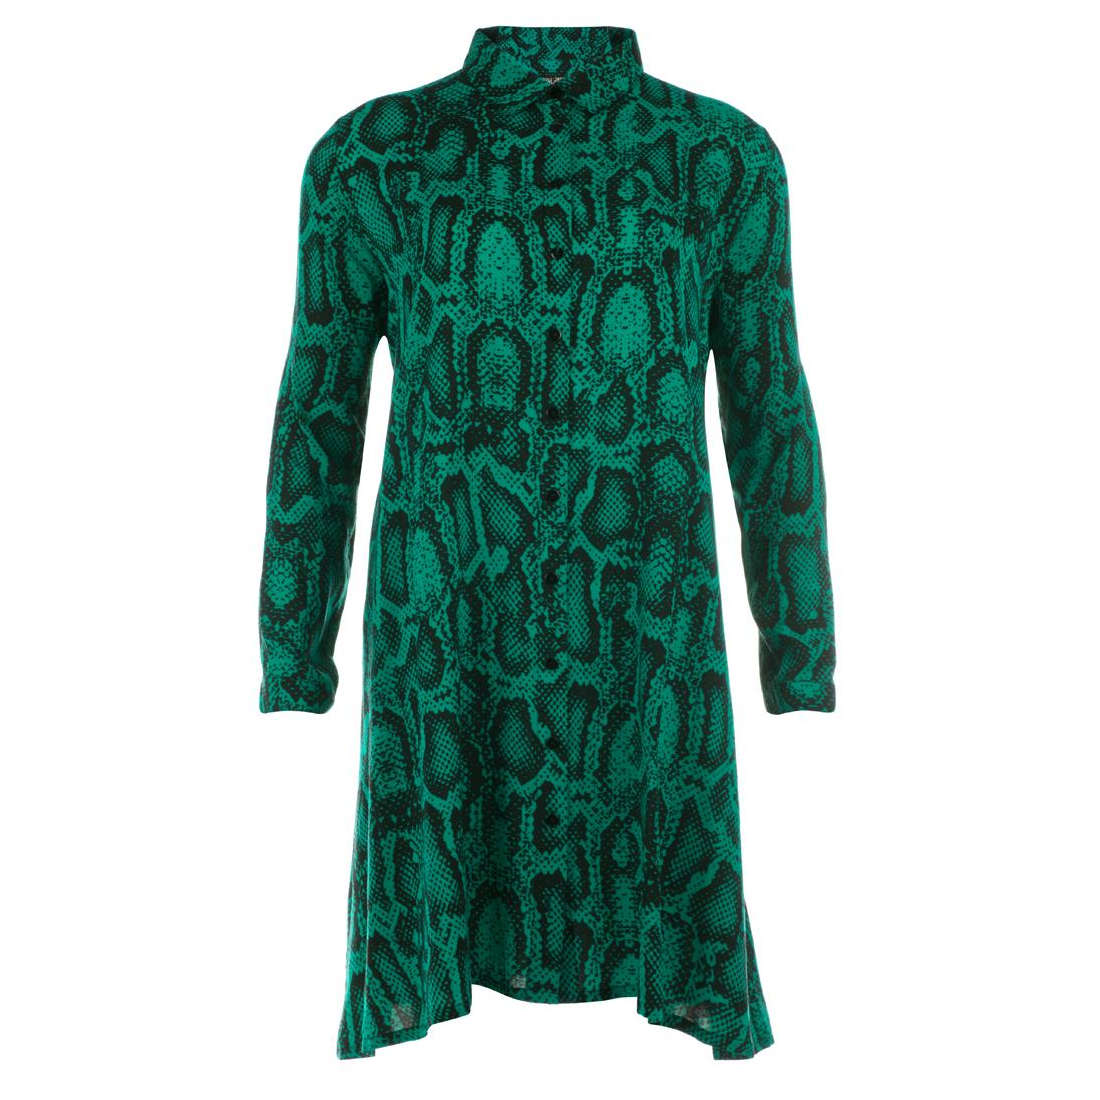 Juffrouw Jansen jurk indy-w19 in het Groen